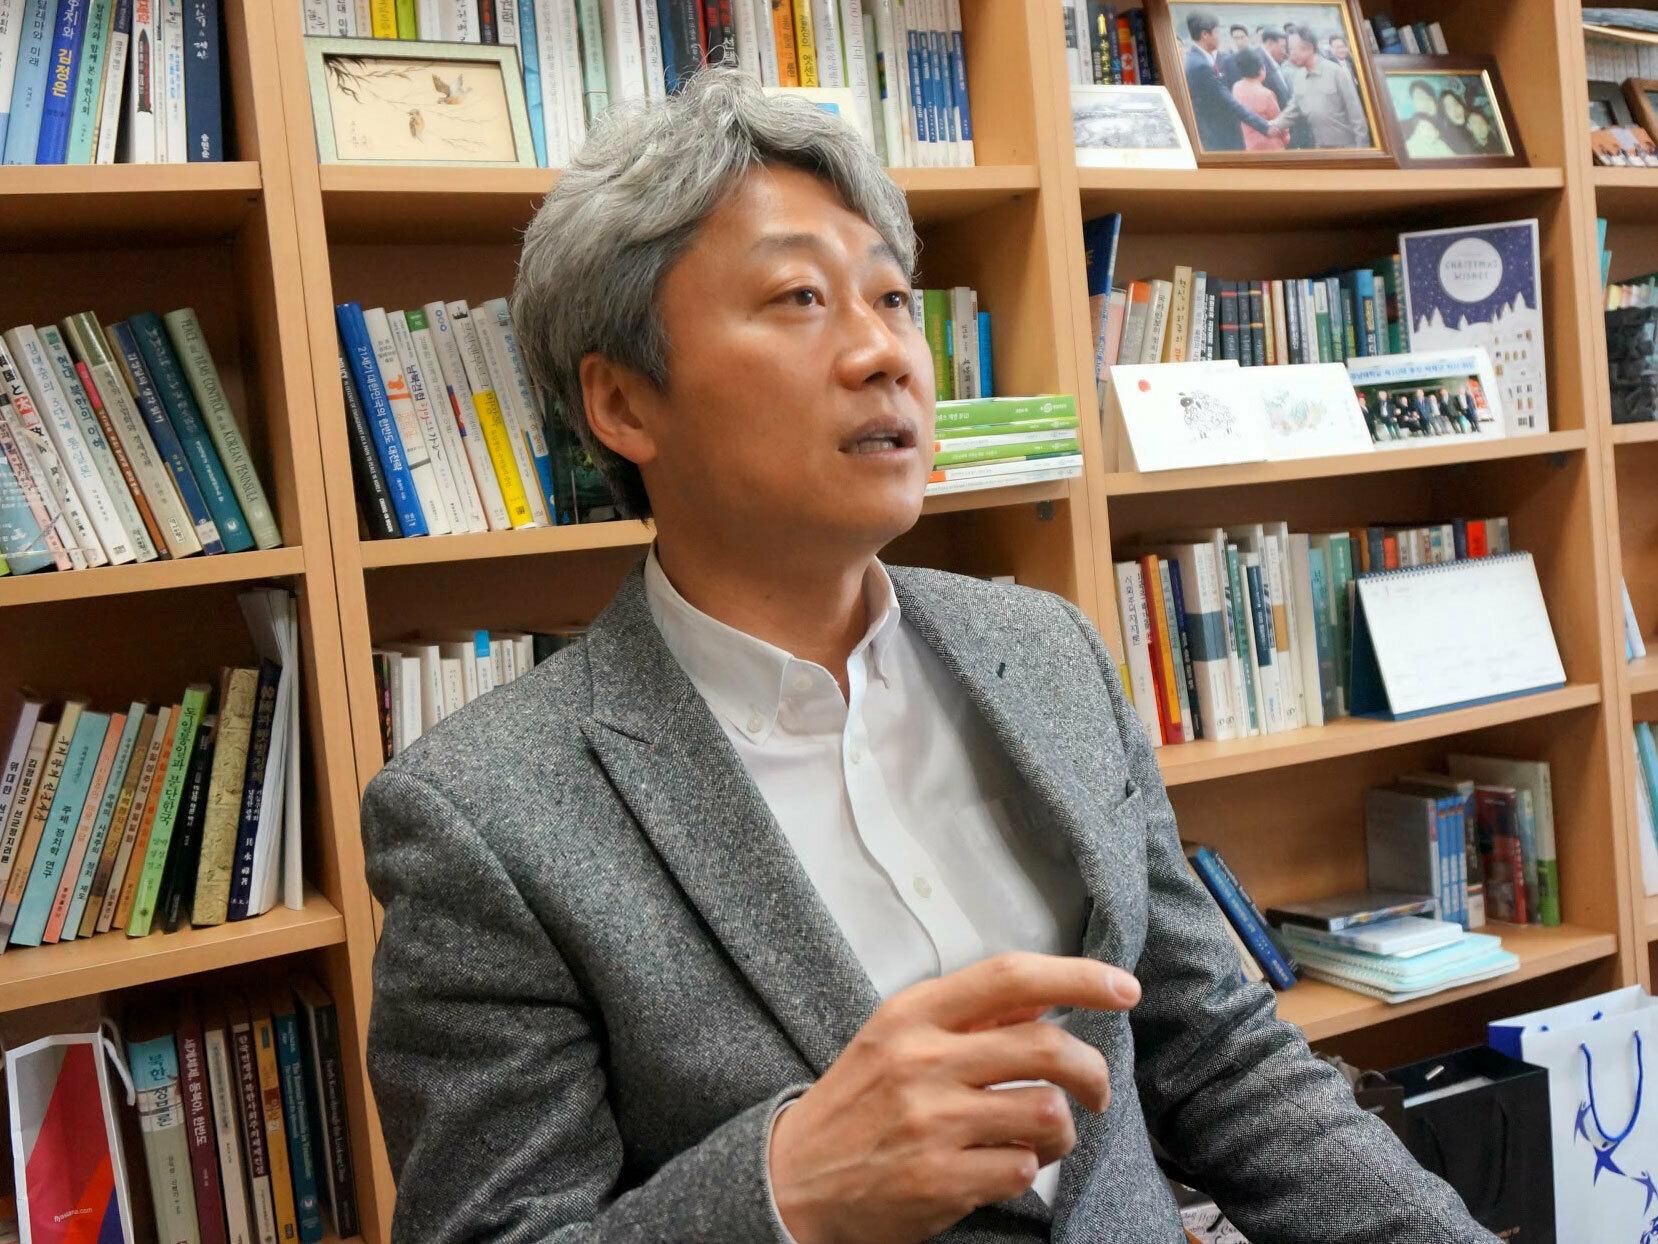 'Songun' now fading away in North Korea: Expert | NK News - North Korea News